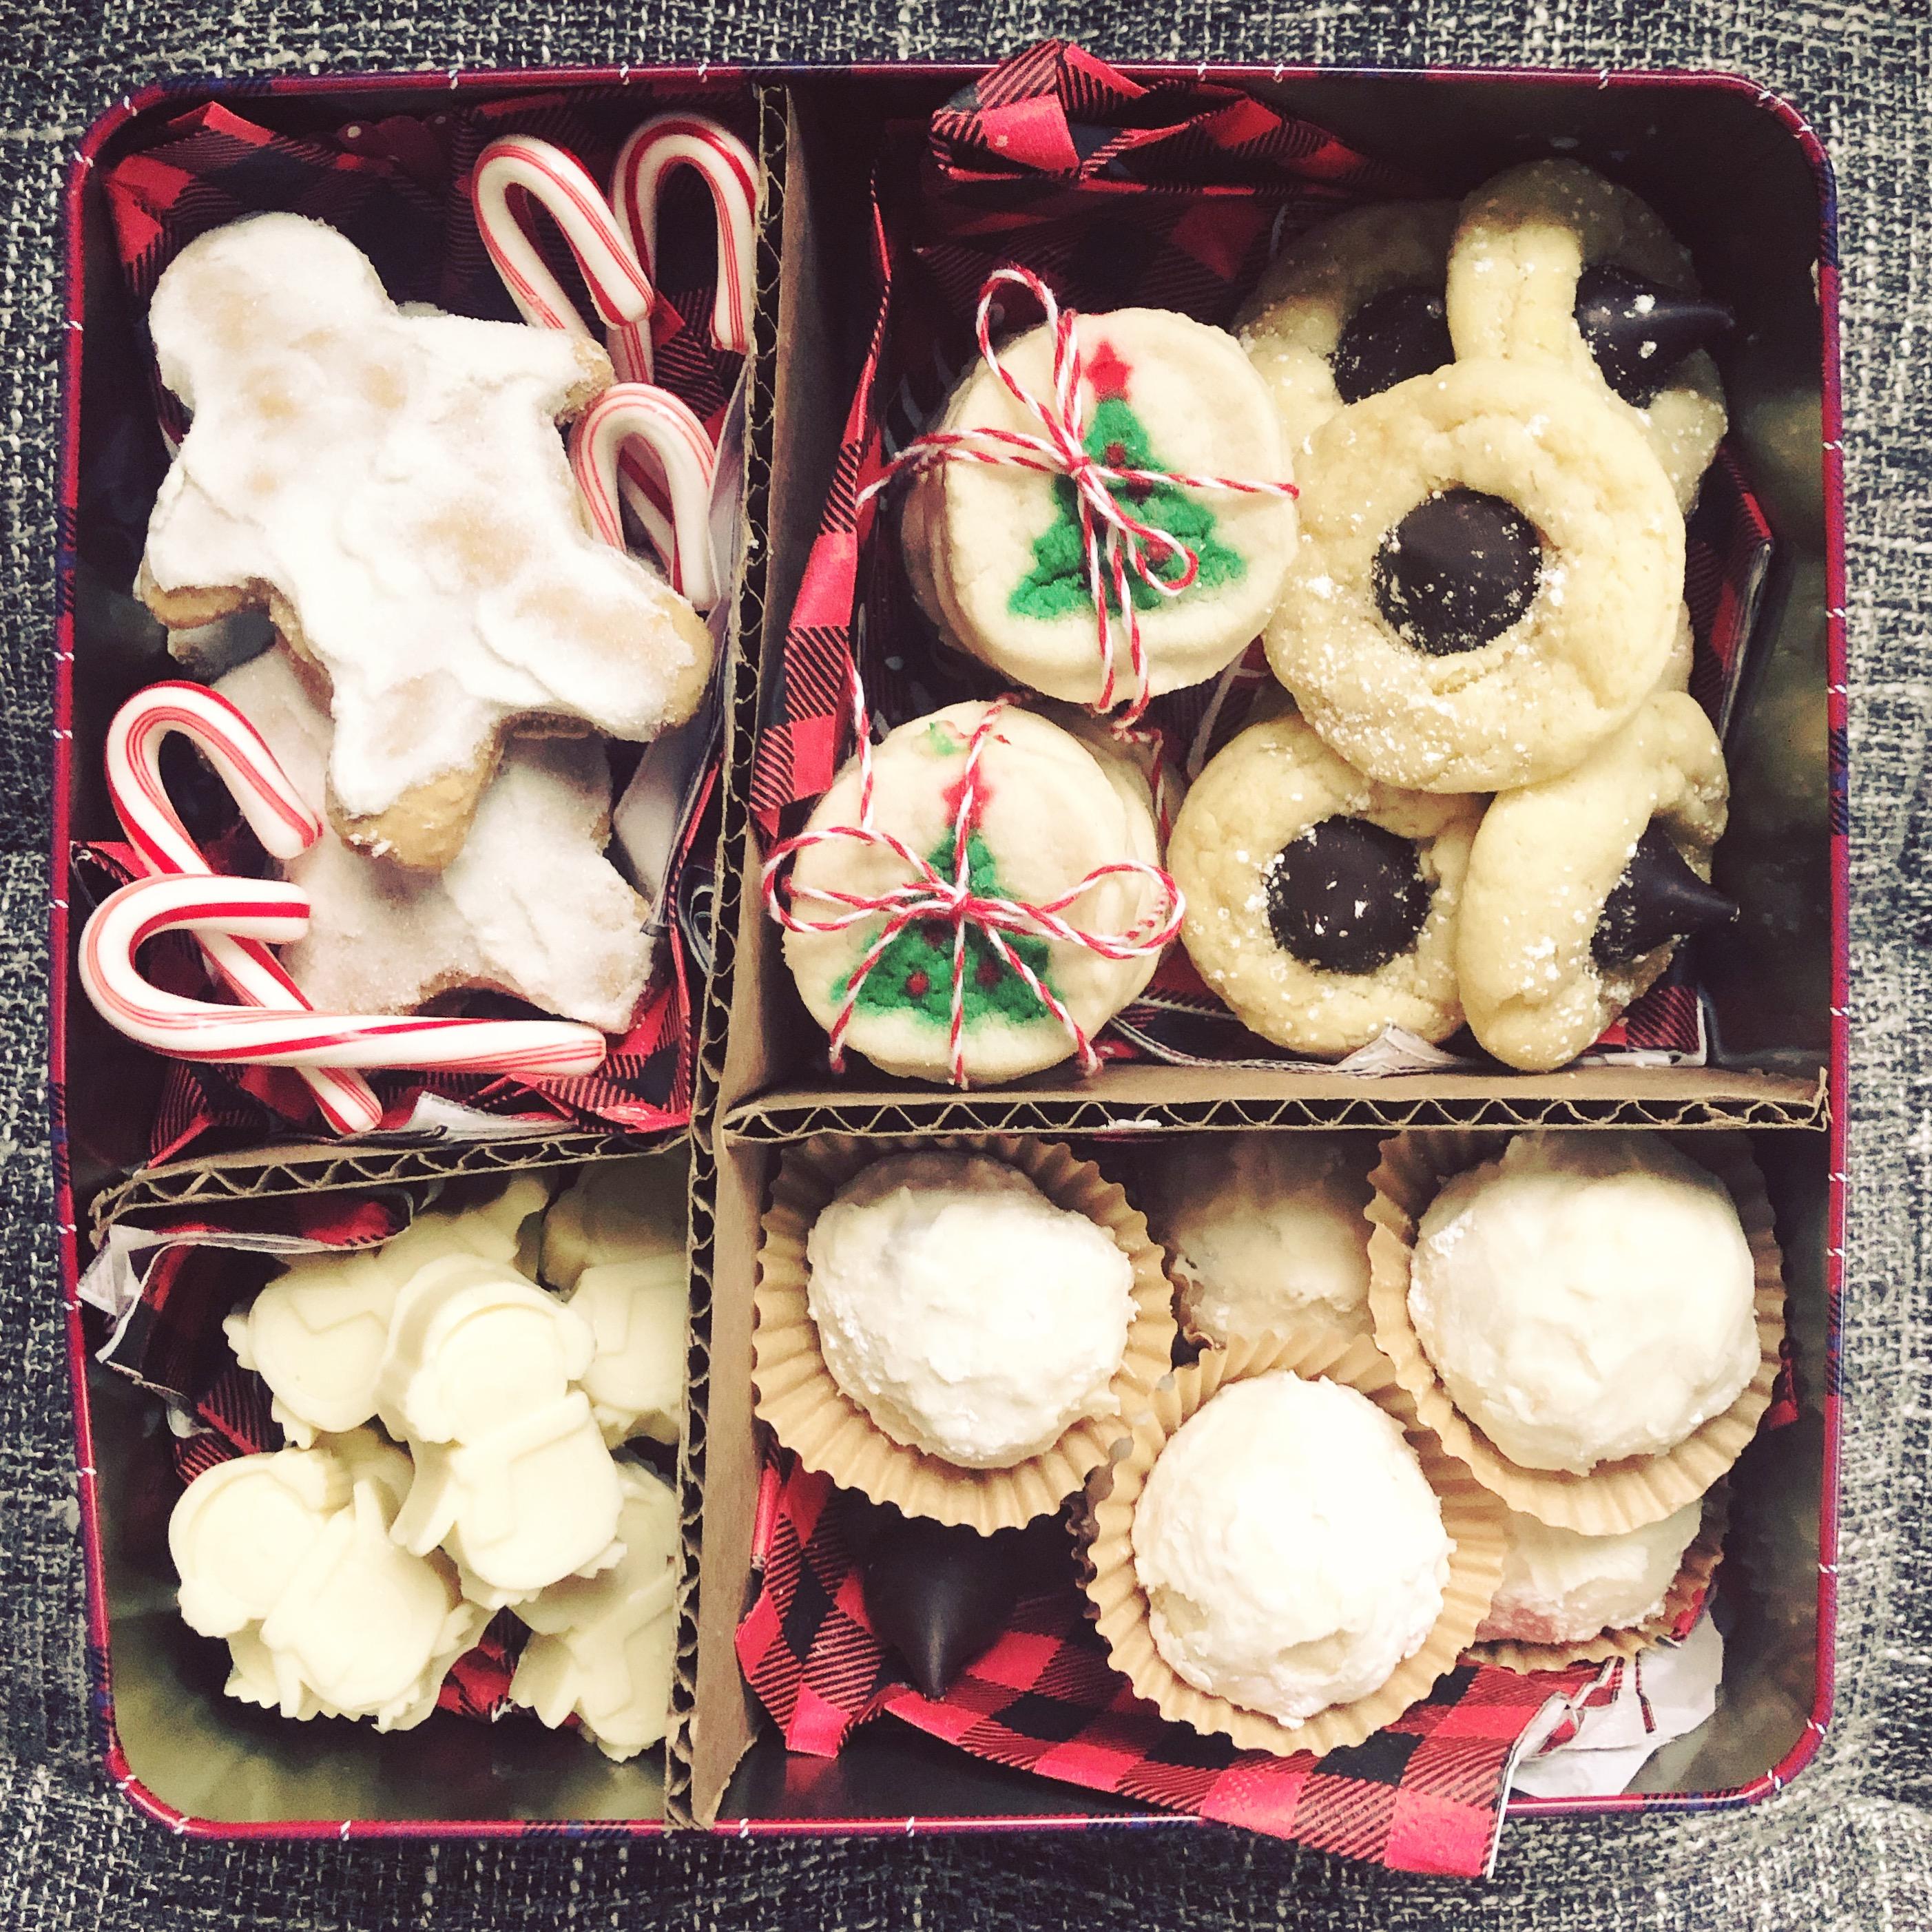 Festive Holiday Food